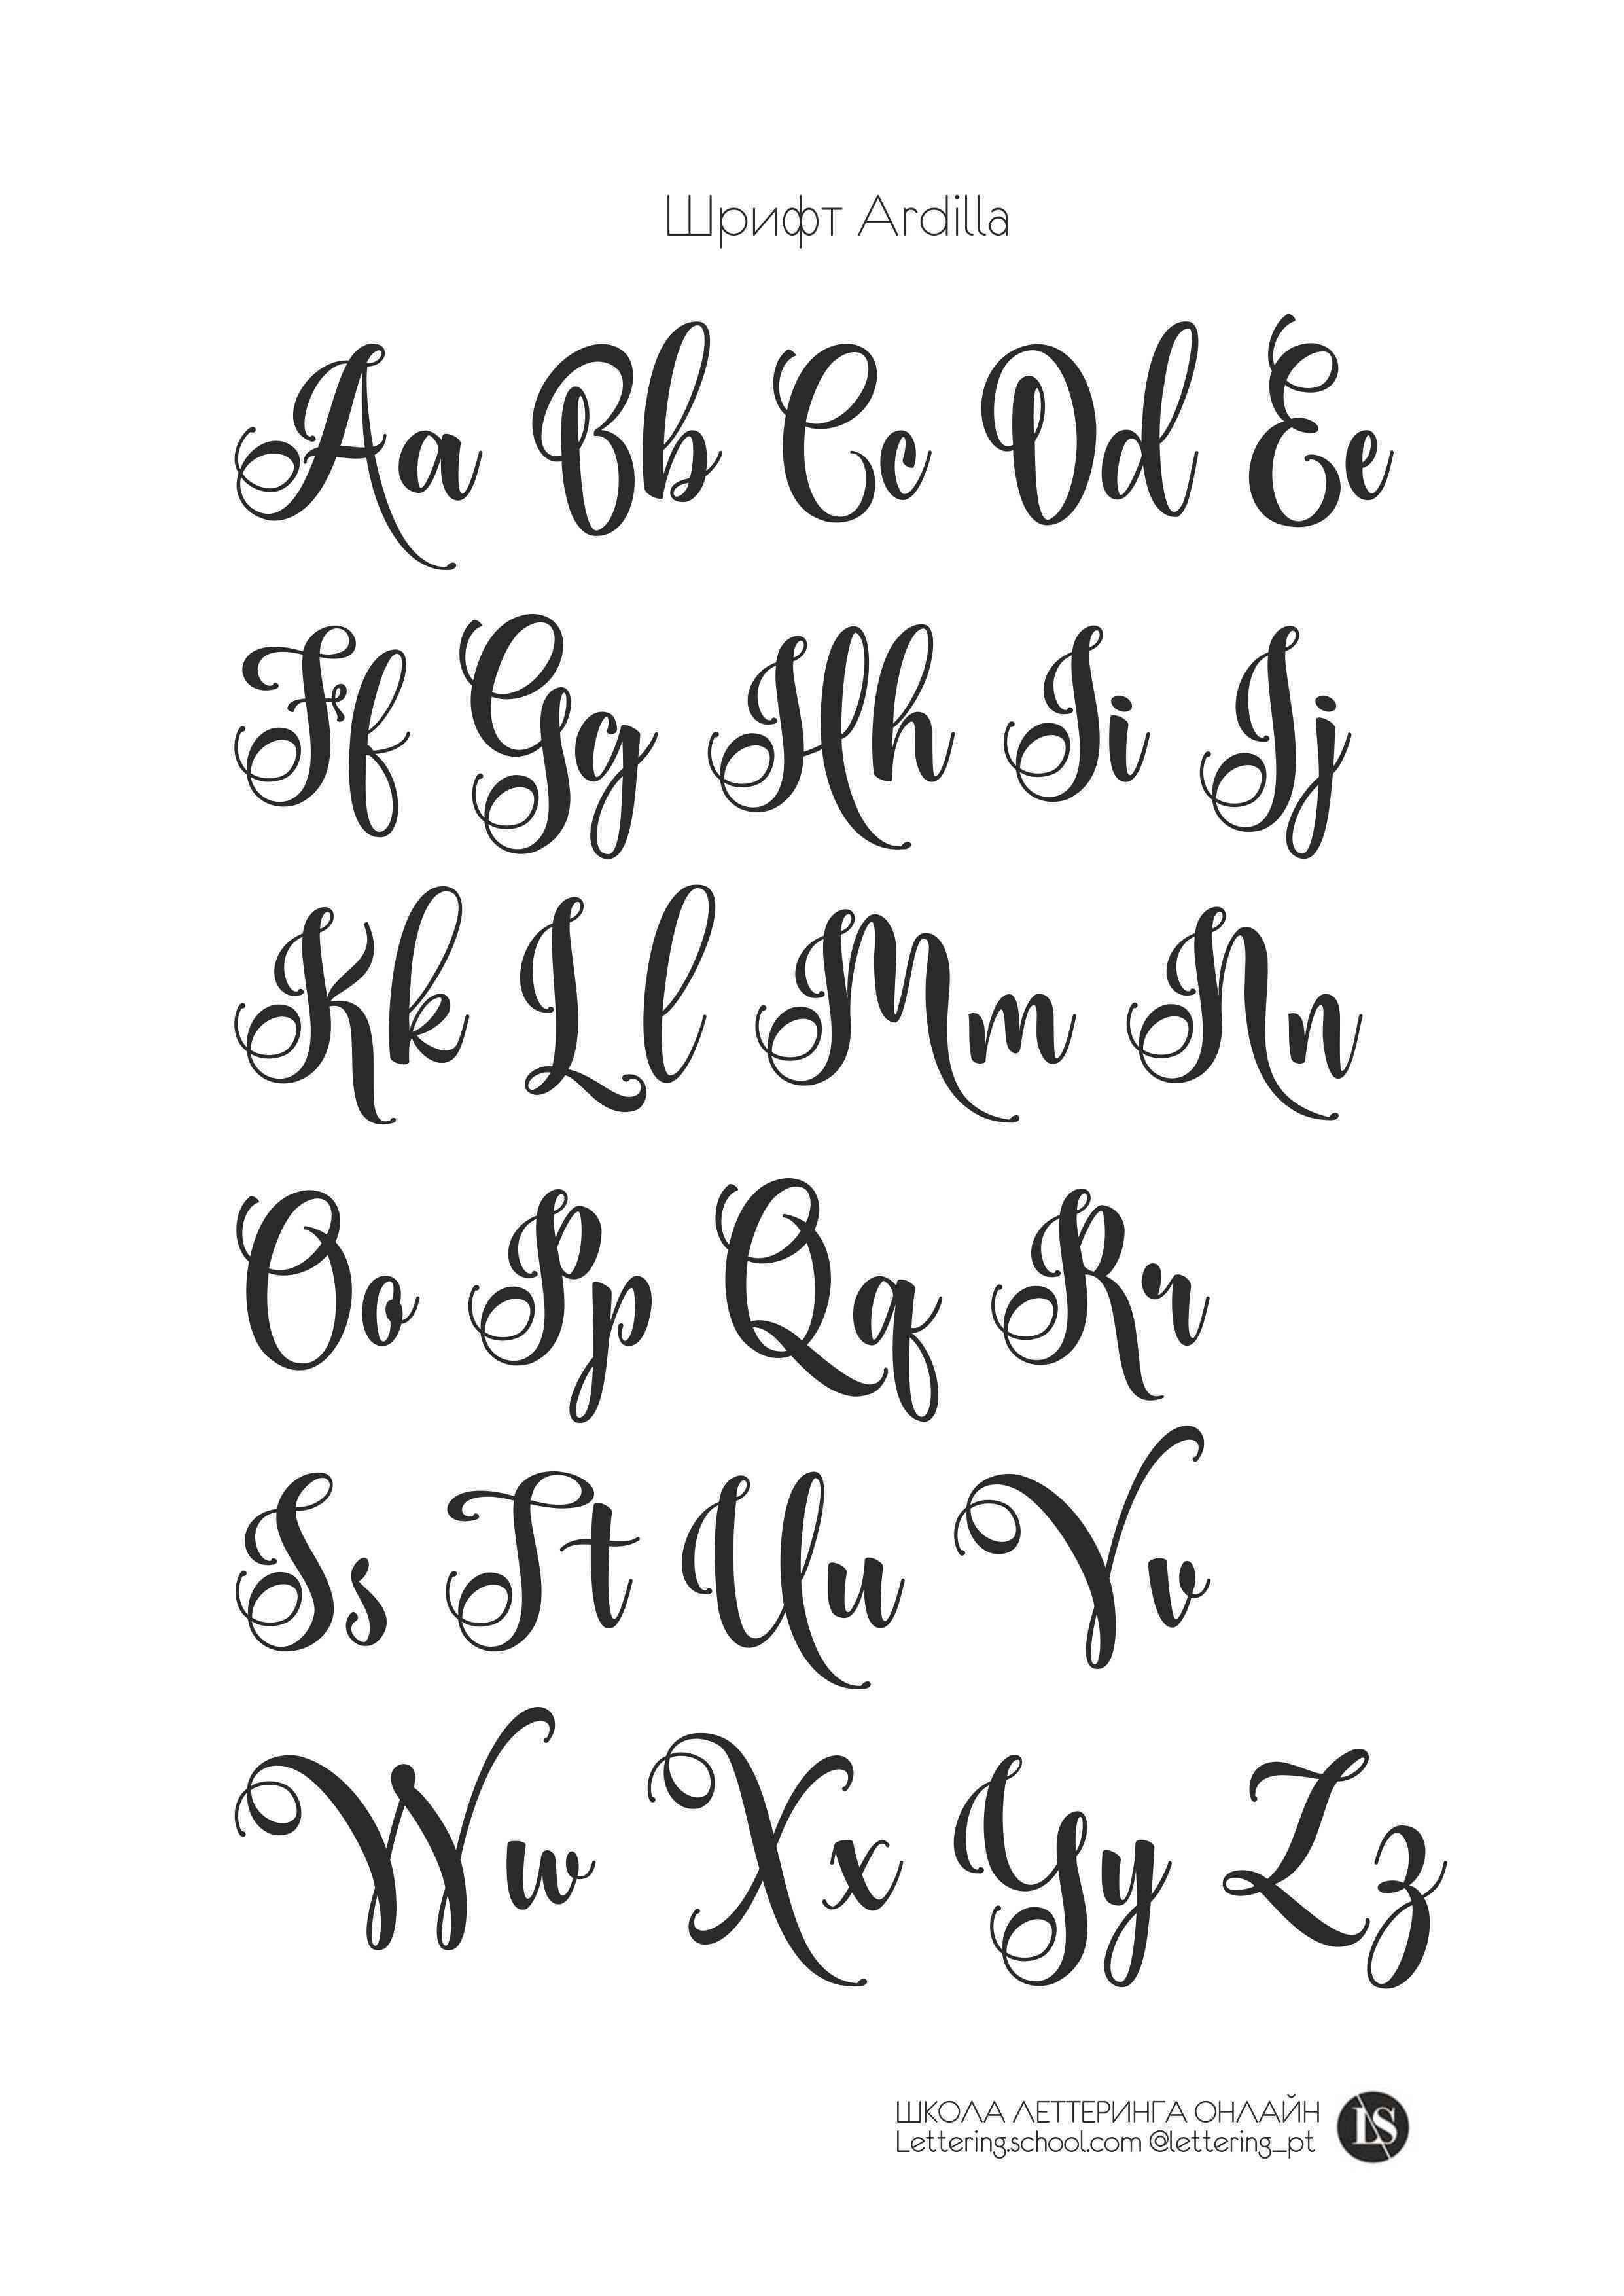 Cursive Calligraphy Alphabets : cursive, calligraphy, alphabets, Awesome, Script, Handwriting, Practice, Paijo, Network, Lettering, Fonts,, Alphabet,, Tattoo, Fonts, Cursive